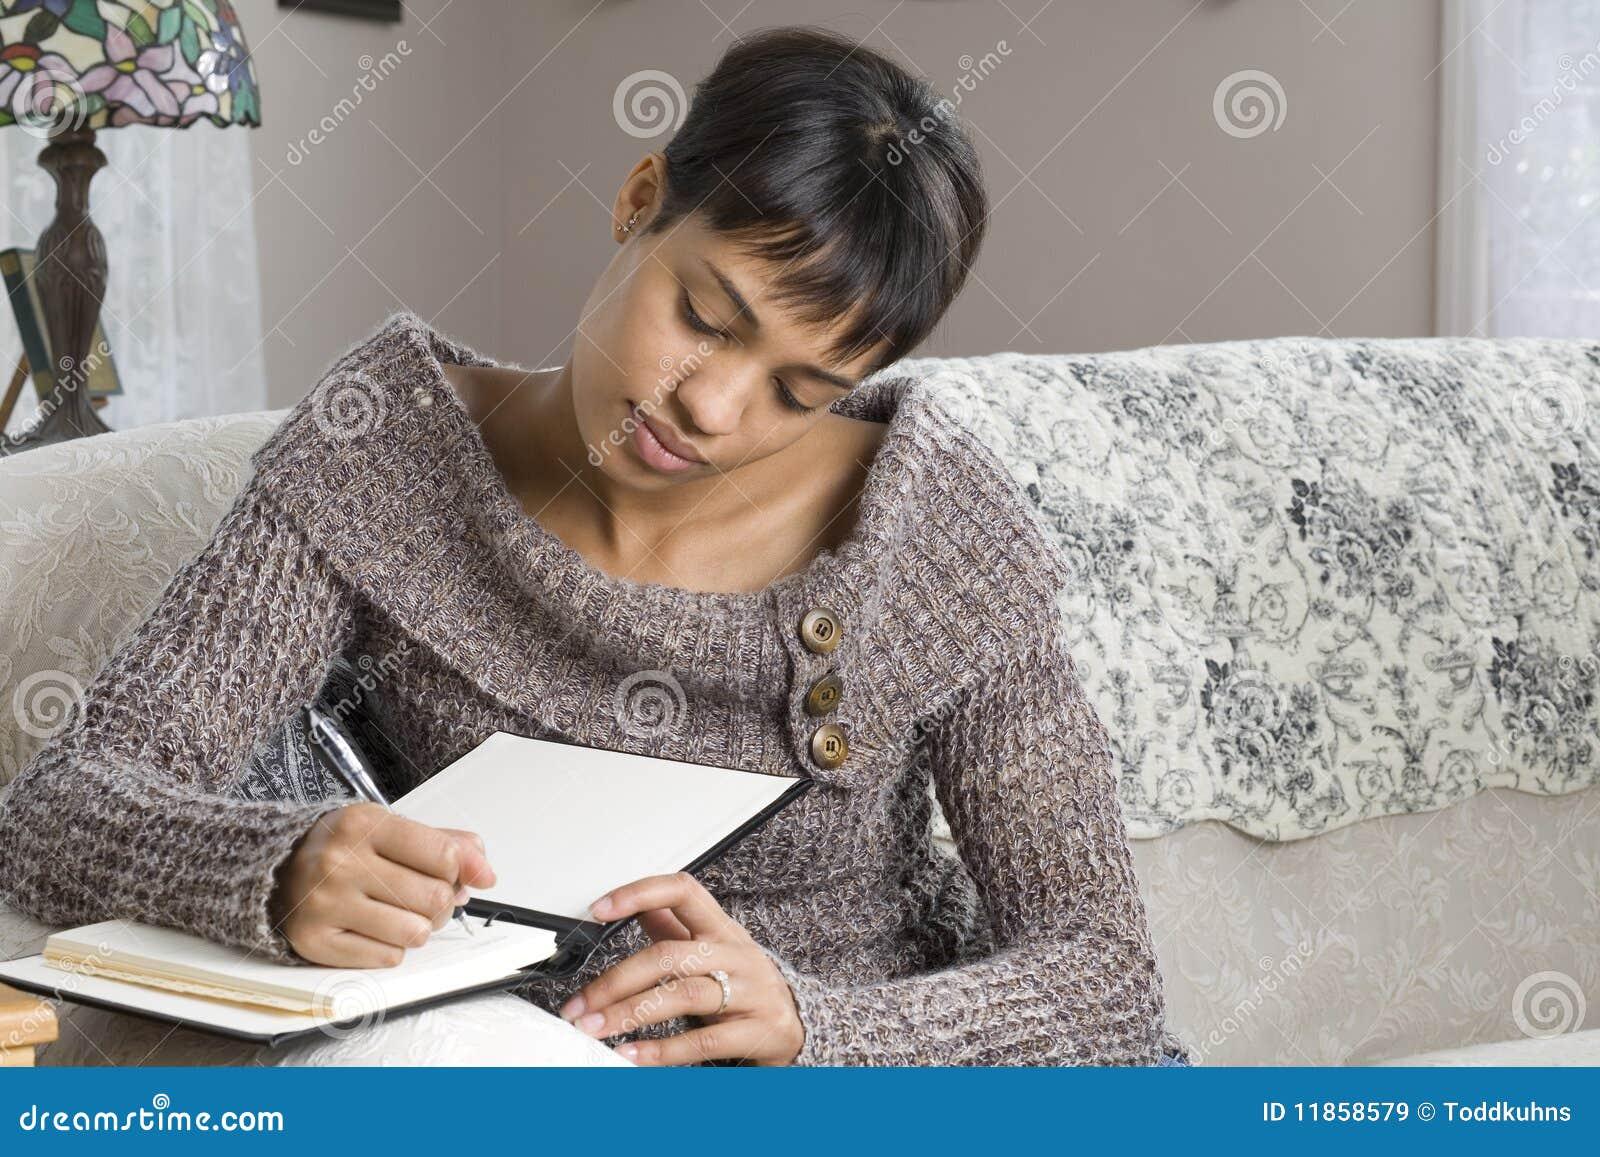 Women Writing Africa: The Eastern Region